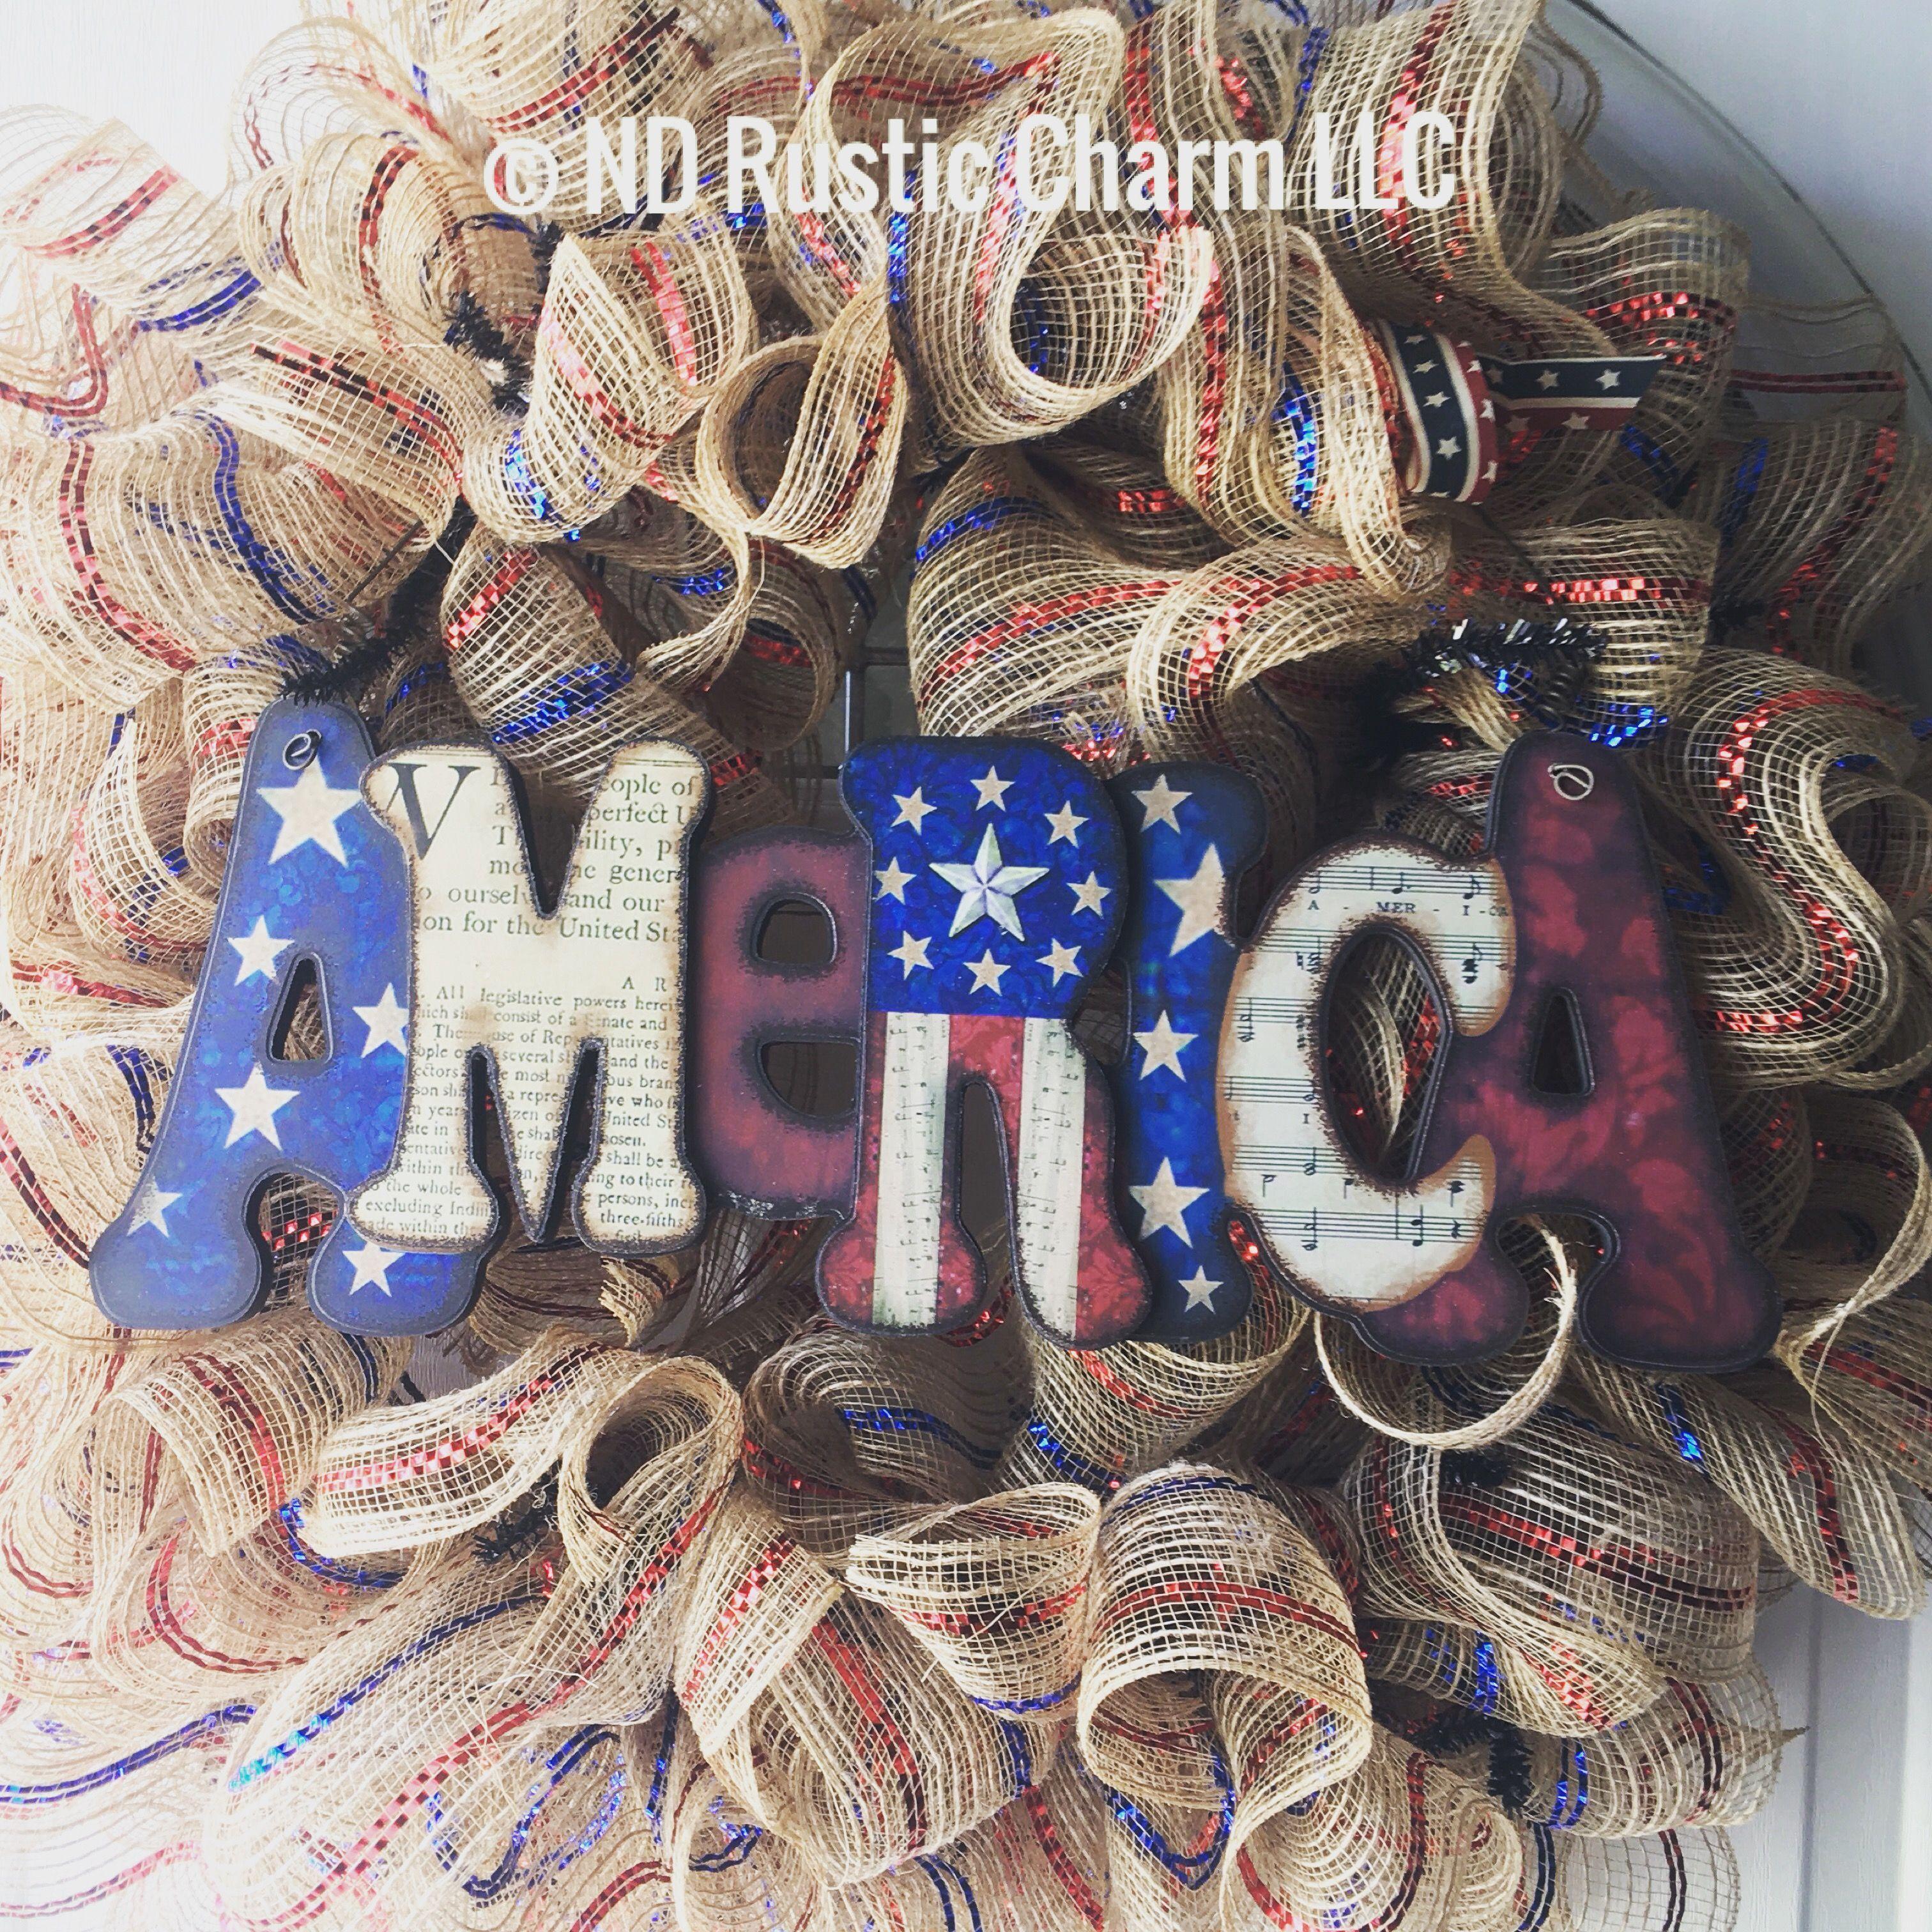 American Wreath Handmade By Nd Rustic Charm #Wreath #Usa #America